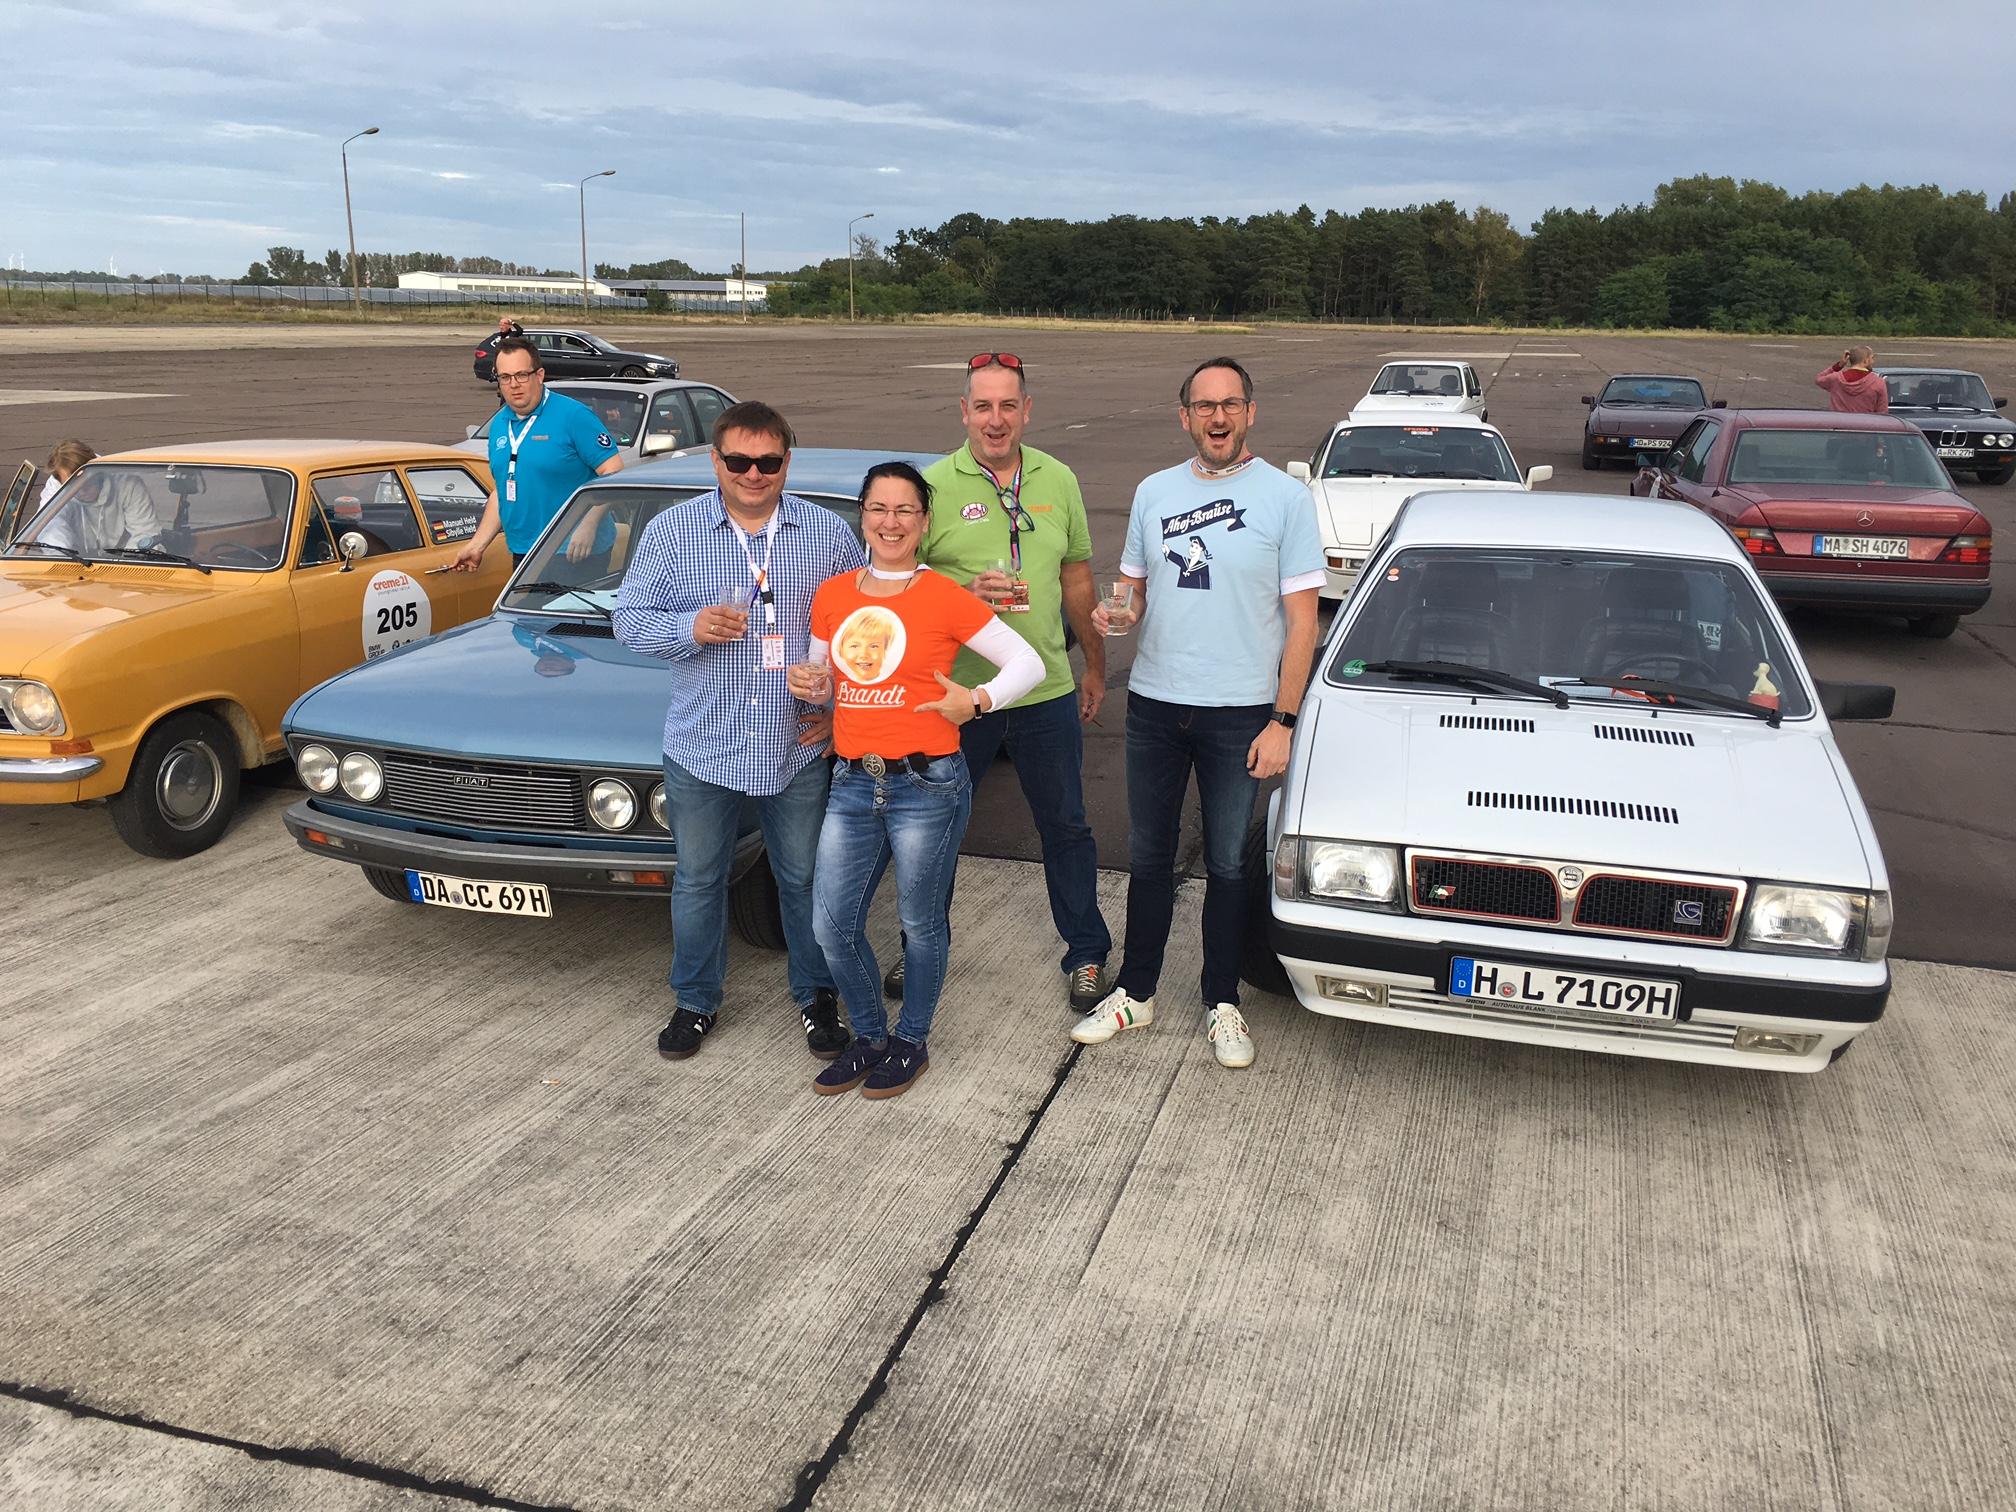 Team auf dem Flugplatz